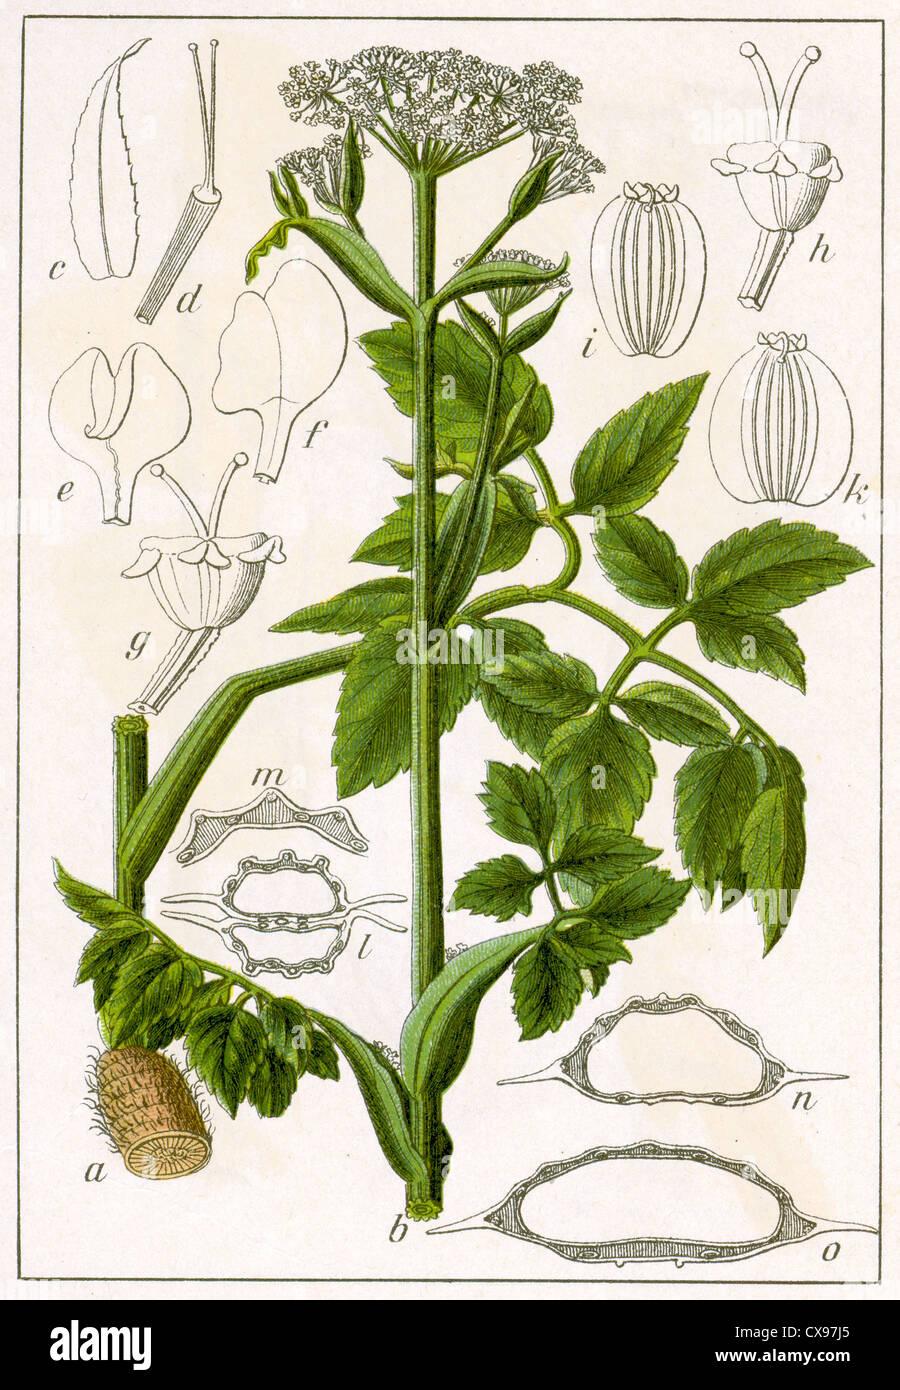 Ostericum palustre - Stock Image